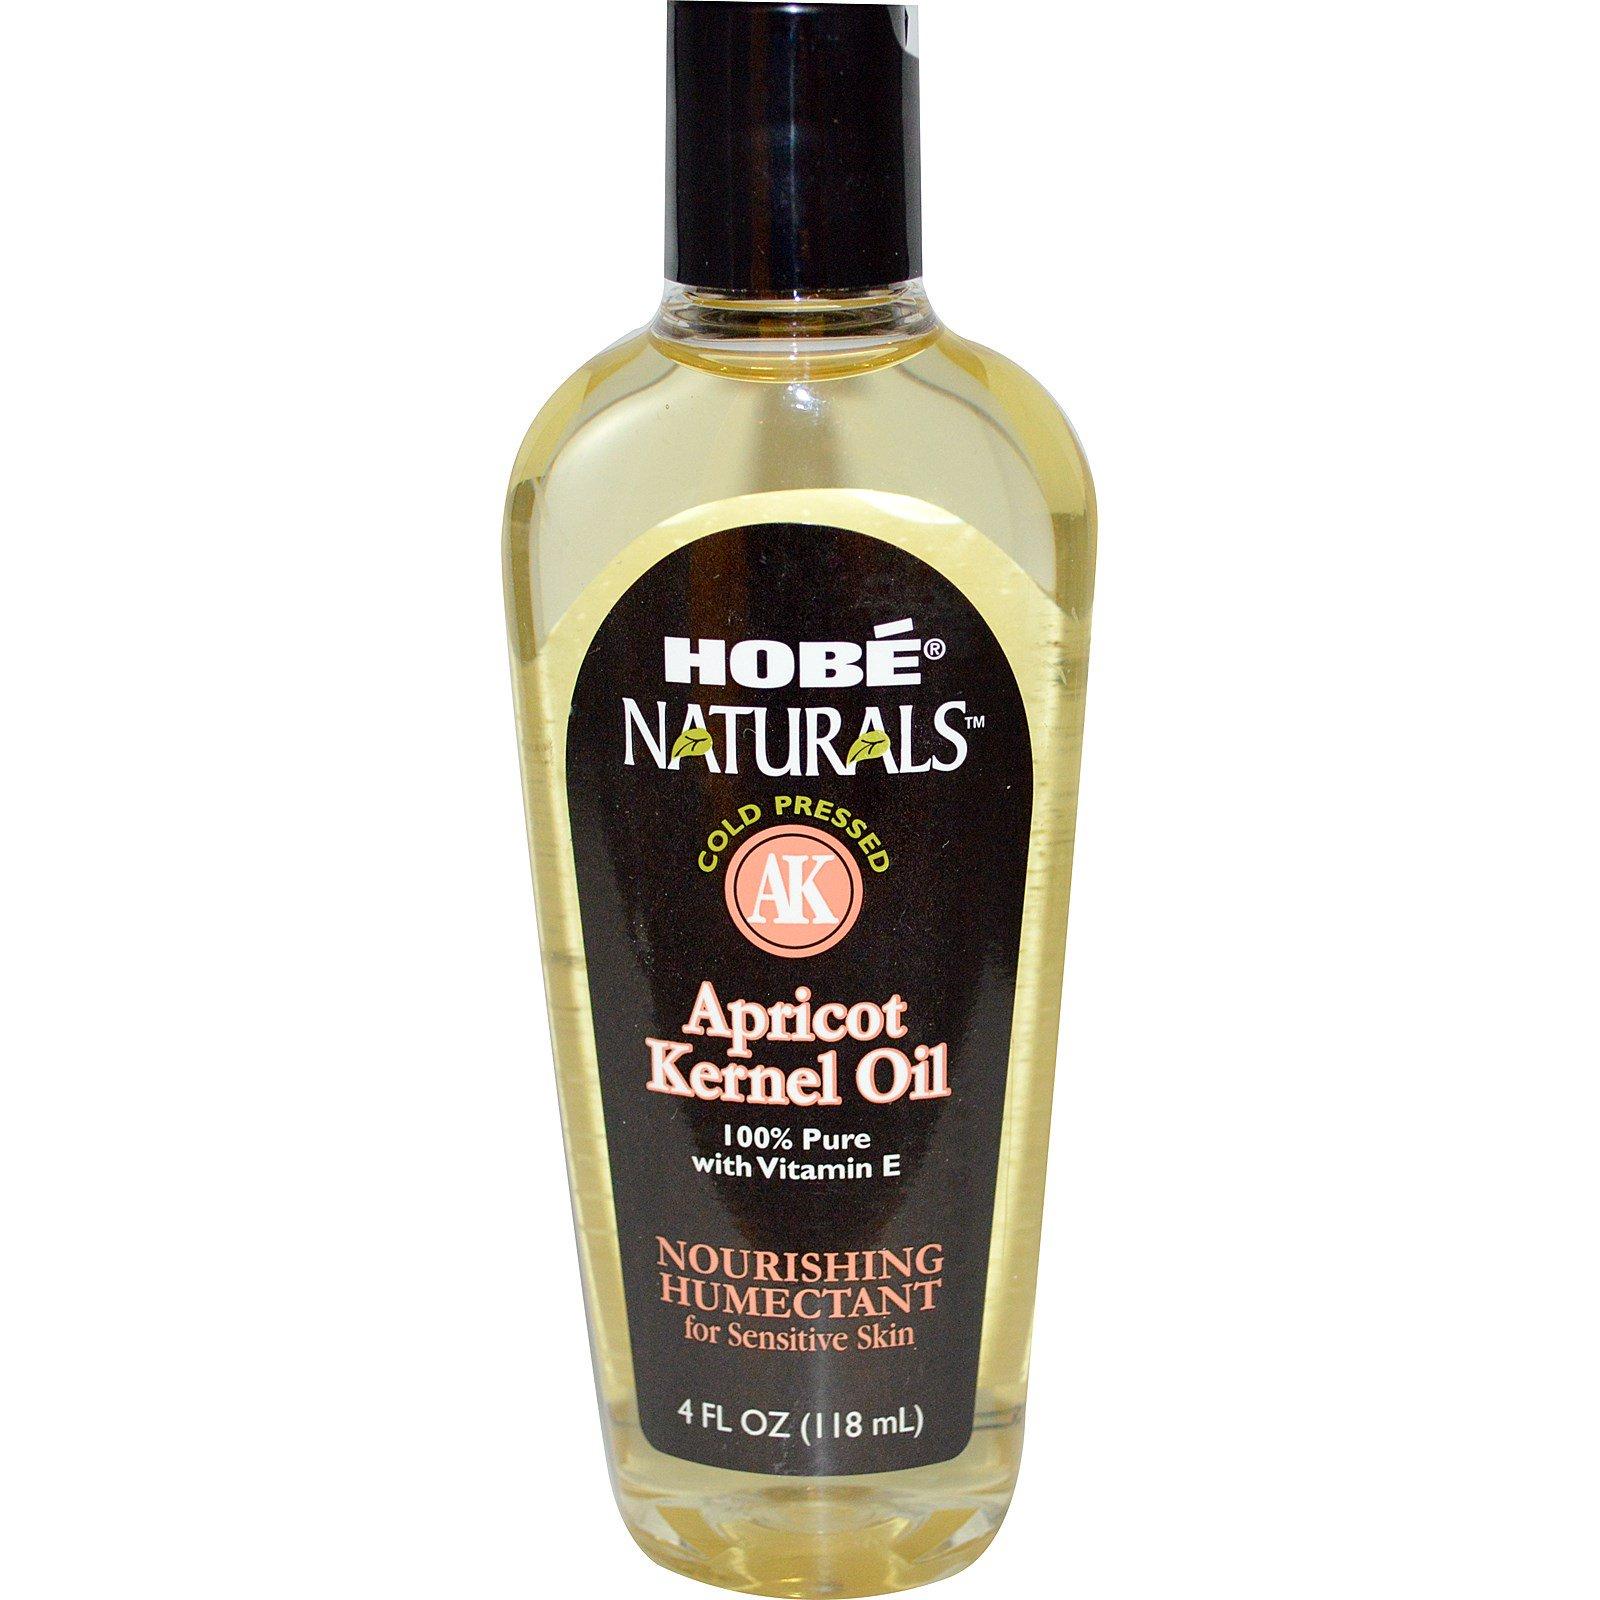 Hobe Labs, Naturals, Абрикосовое масло, 4 жидких унции (118 мл)